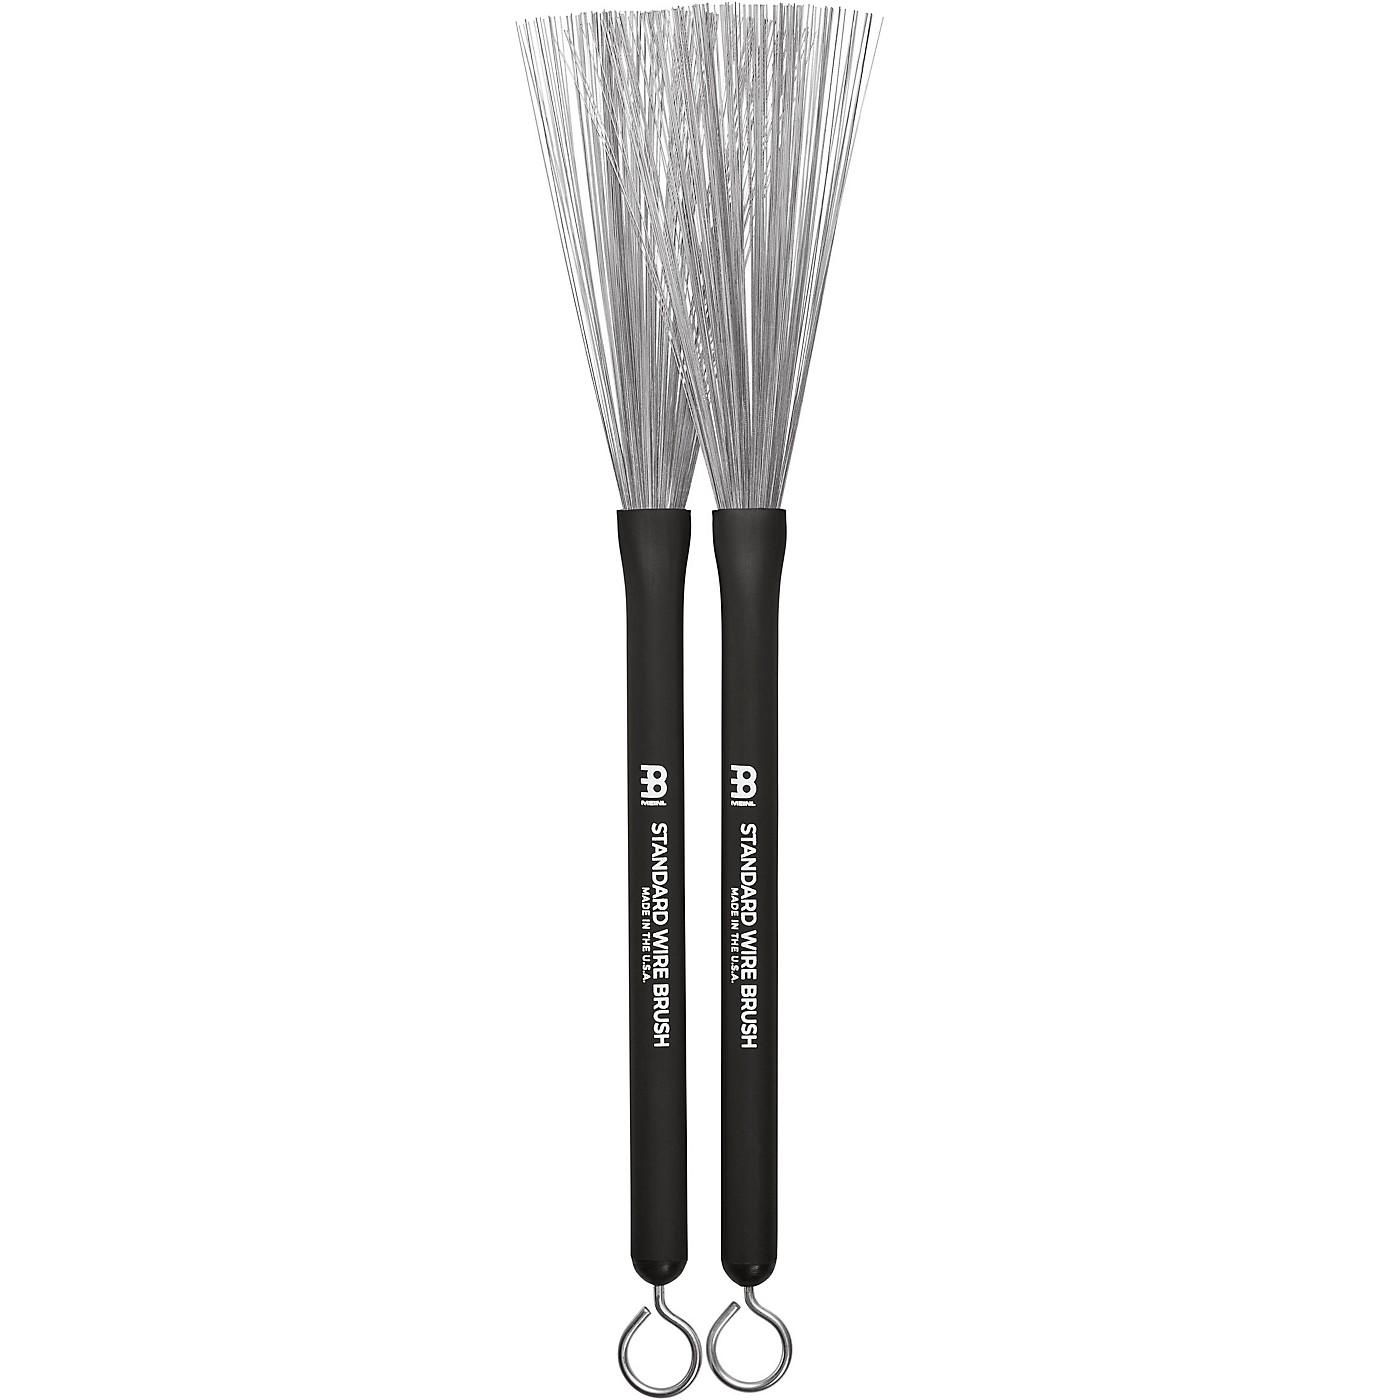 Meinl Stick & Brush Standard Wire Brushes thumbnail